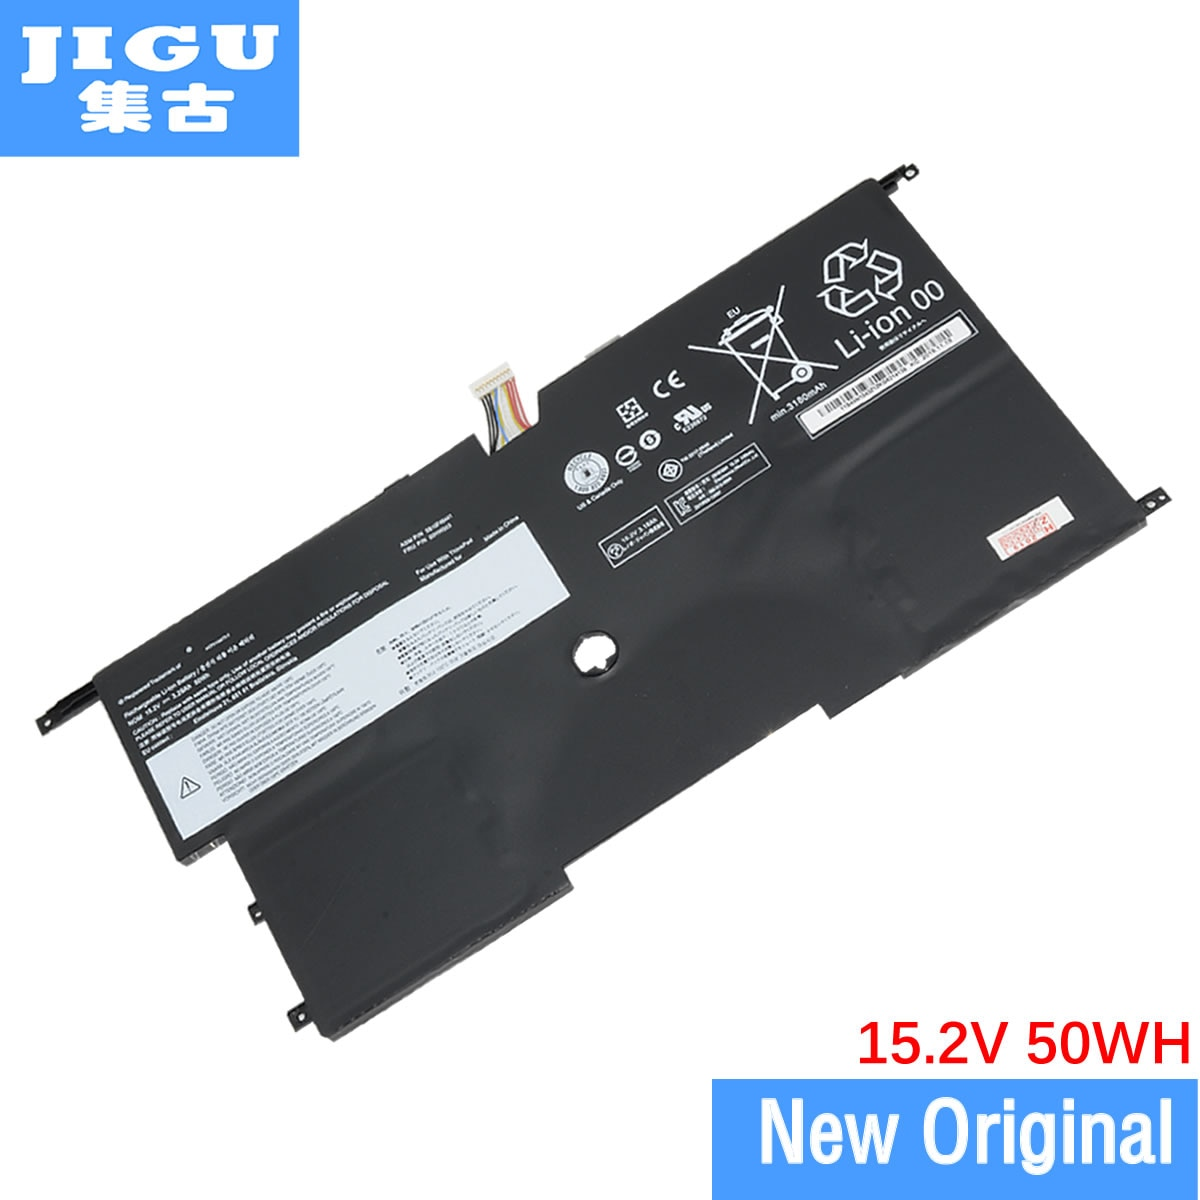 Jigu 15.2 v 51wh orignal bateria do portátil 00hw002 00hw003 45n1070 45n1071 para lenovofor thinkpad x1 carbono 3448 séries win8